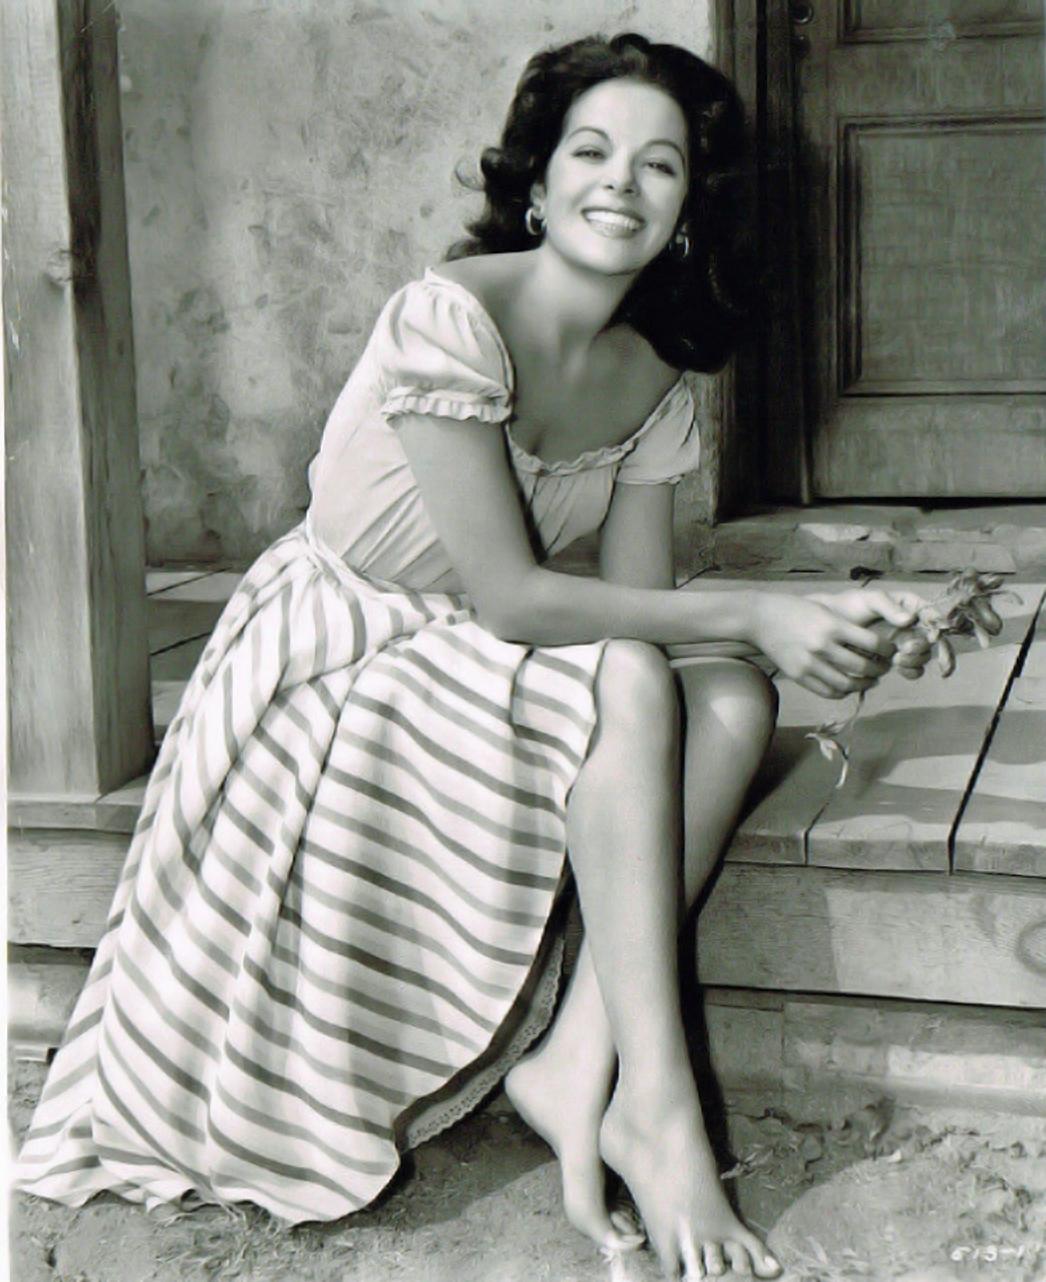 Yvette Dugay